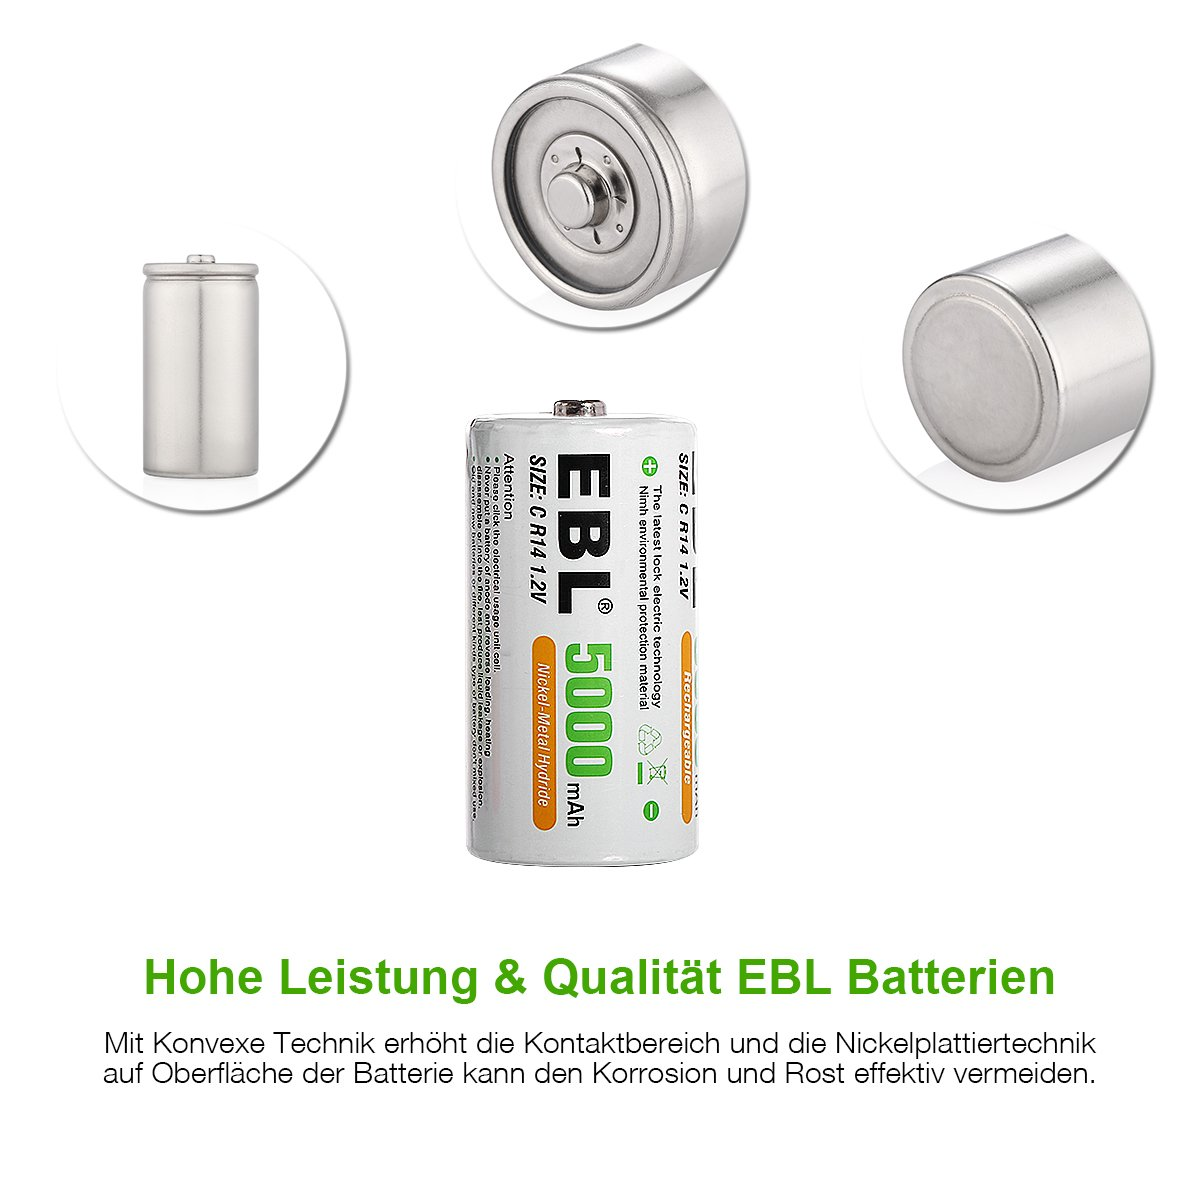 EBL 5000mAh Baby C Akkus mit hoher Kapazität Ni-MH wiederaufladbare Akkus 4 Stück